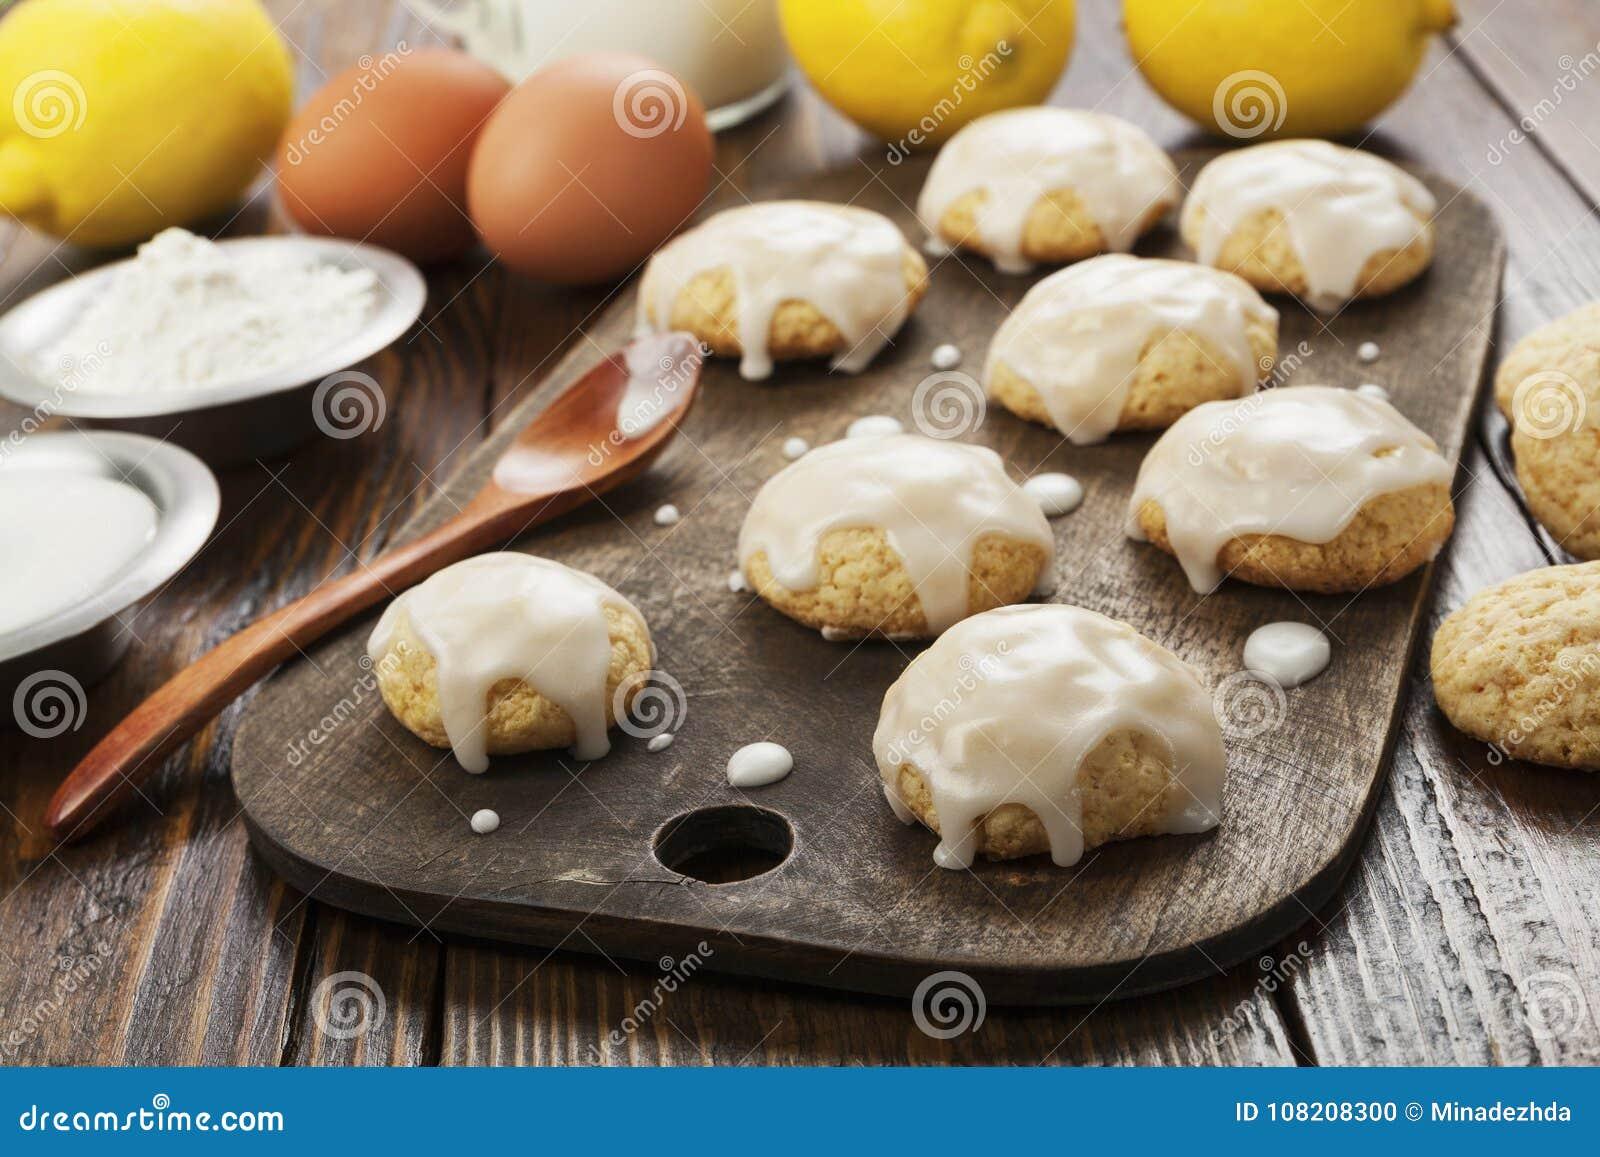 Lemon glaze cookies